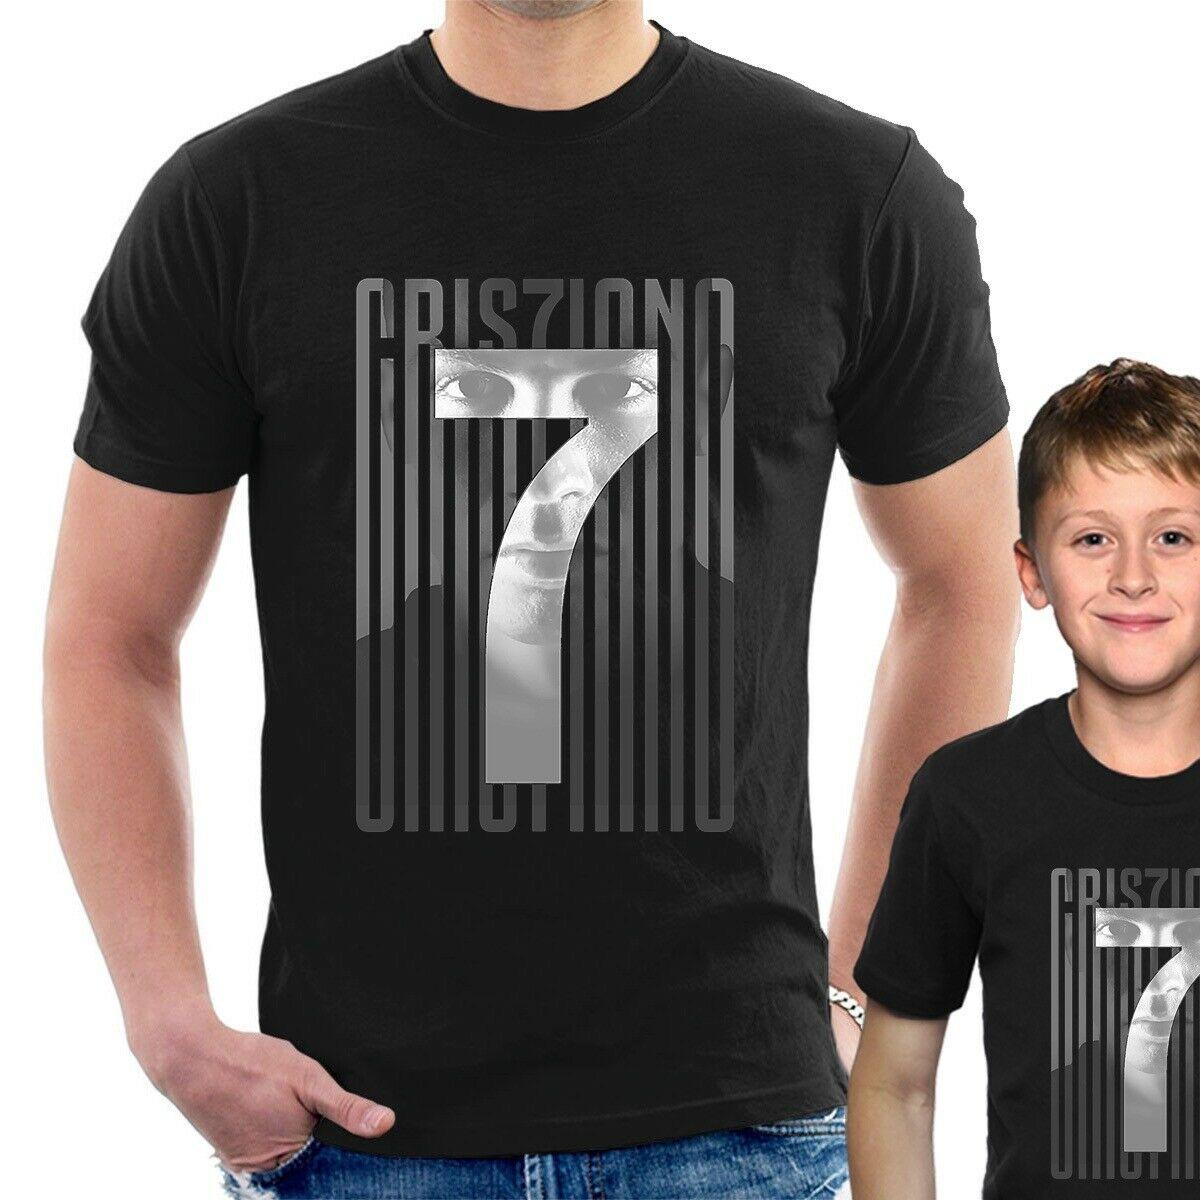 CRISTIANO RONALDO KIDS FOOTBALL LEGEND T SHIRT MADRID BOYS GIRLS CASUAL T33